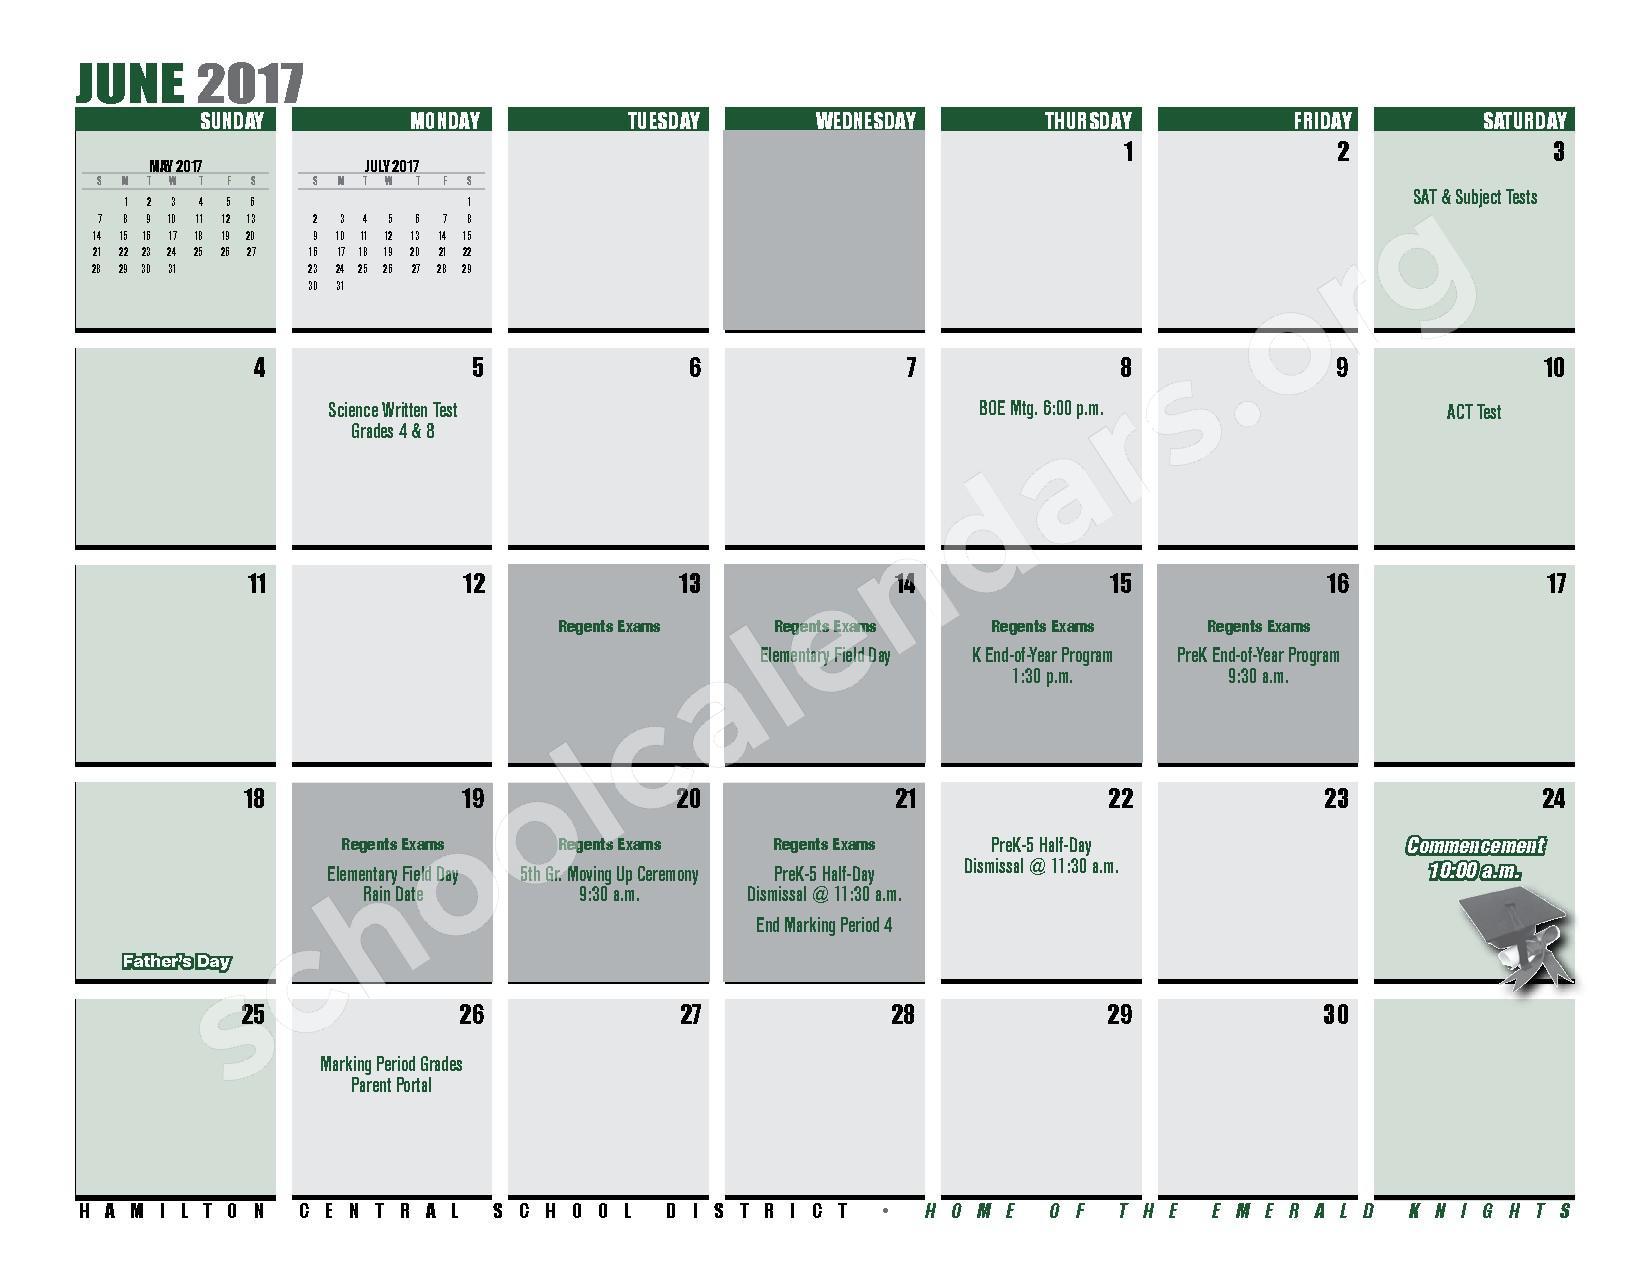 2016 - 2017 District Calendar – Hamilton Central School District – page 27